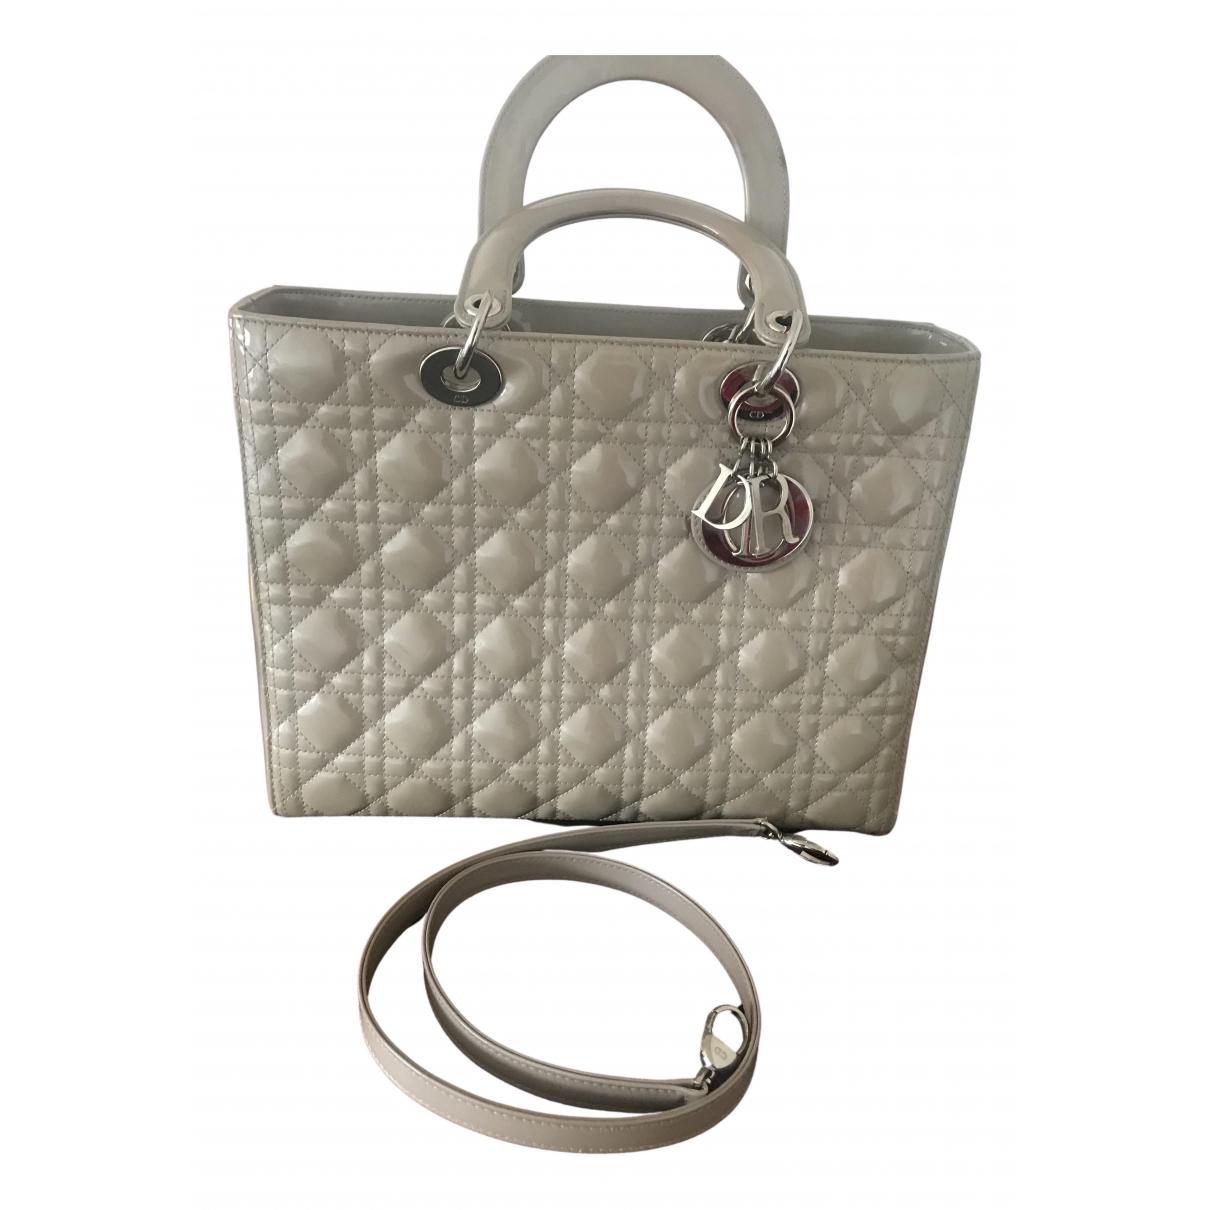 Dior Lady Dior Grey Patent leather handbag for Women N